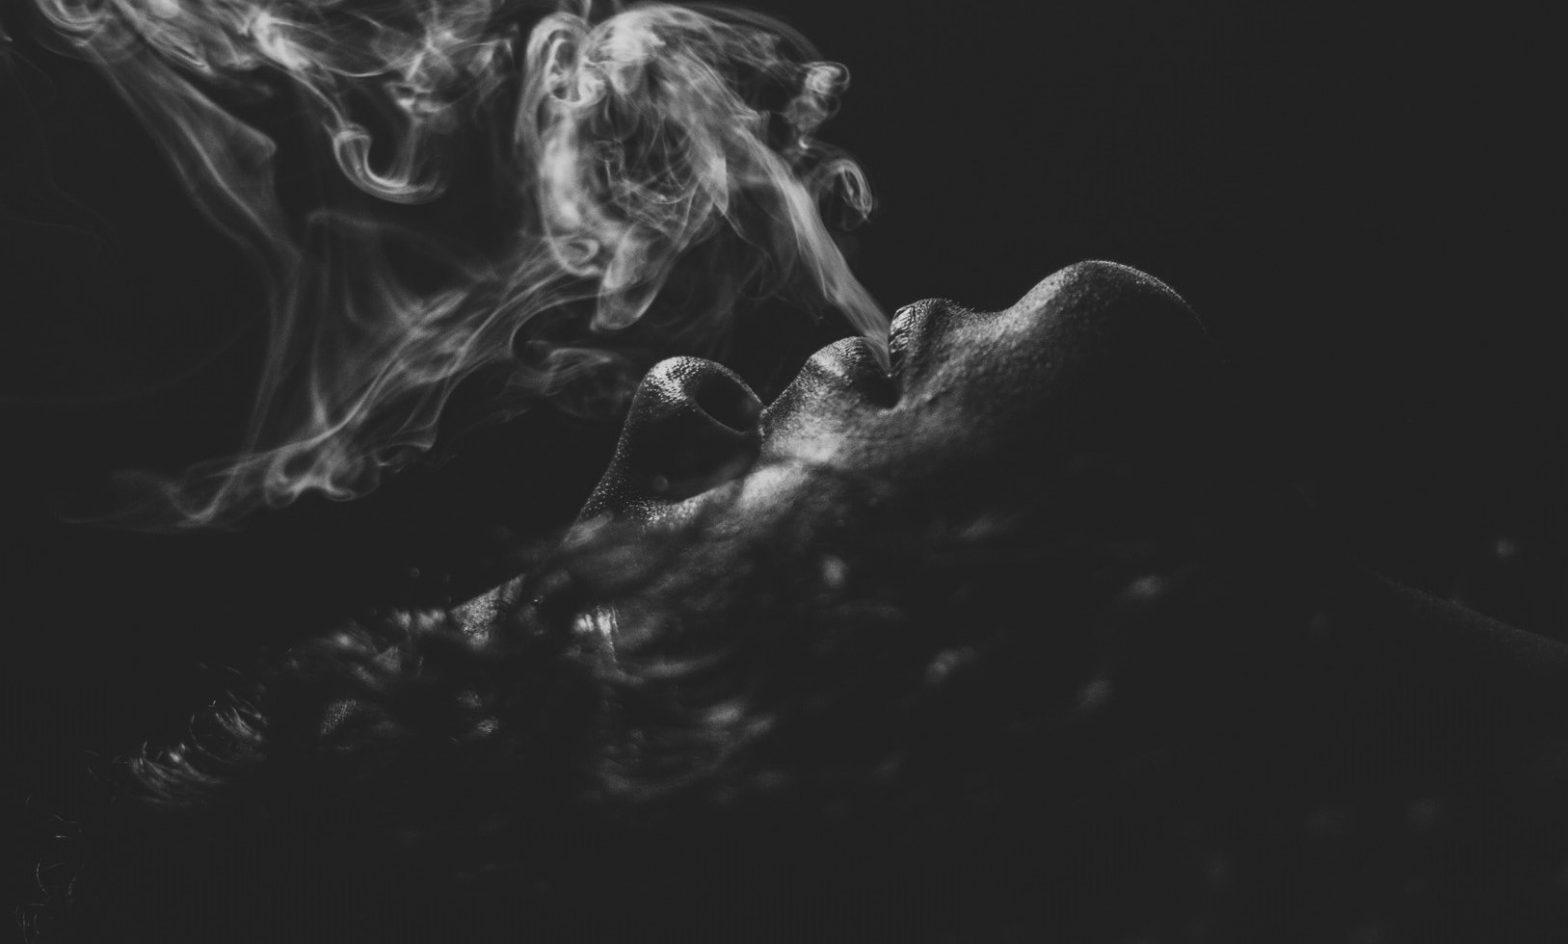 Black and white image of cigar smoking